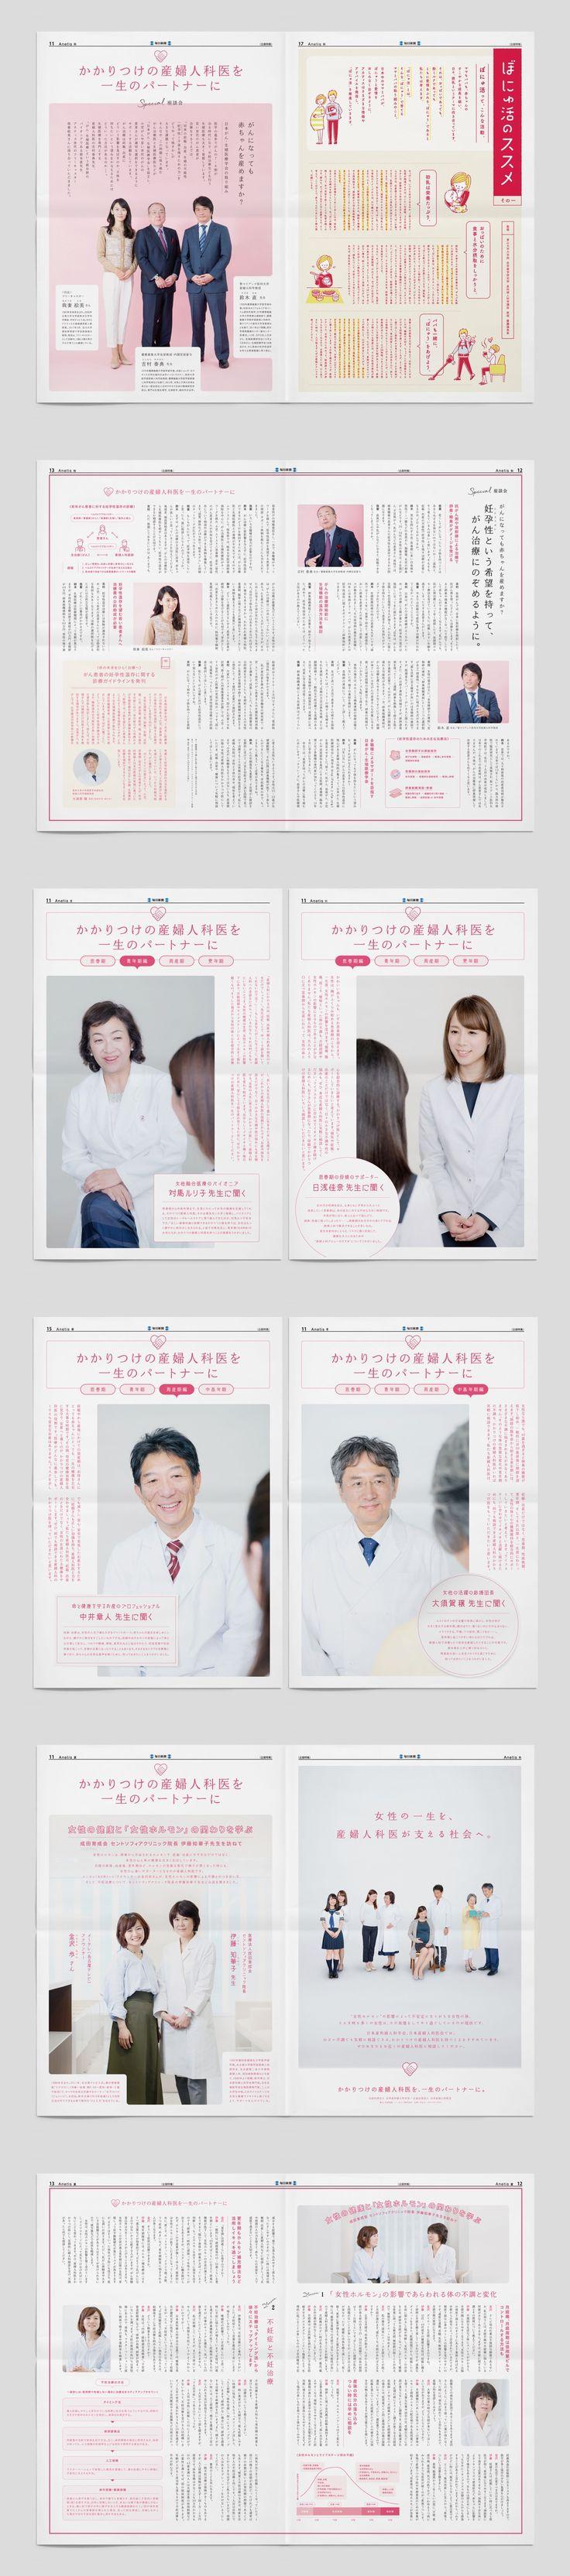 FREE MAGAZINE – 東京・京都 デザイン事務所 株式会社エイティワン EIGHTY ONE Inc.